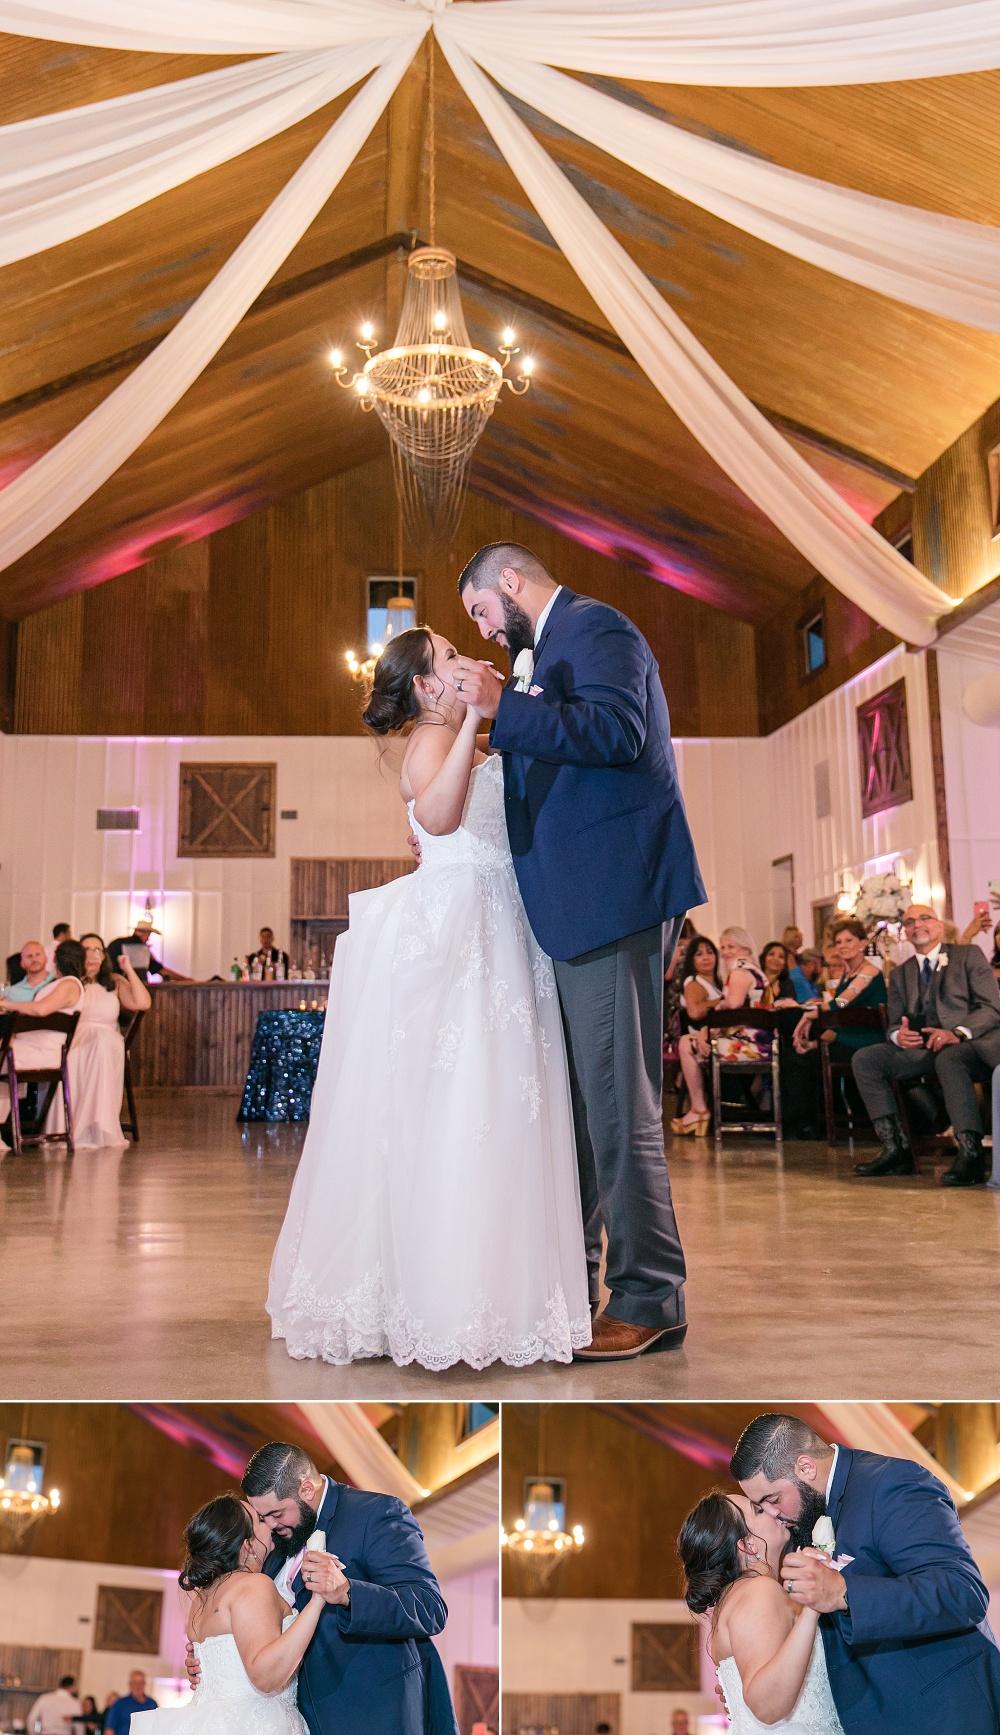 Wedding-Photographer-Bulverde-Texas-Western-Sky-Event-Venue-Carly-Barton-Photography_0062.jpg